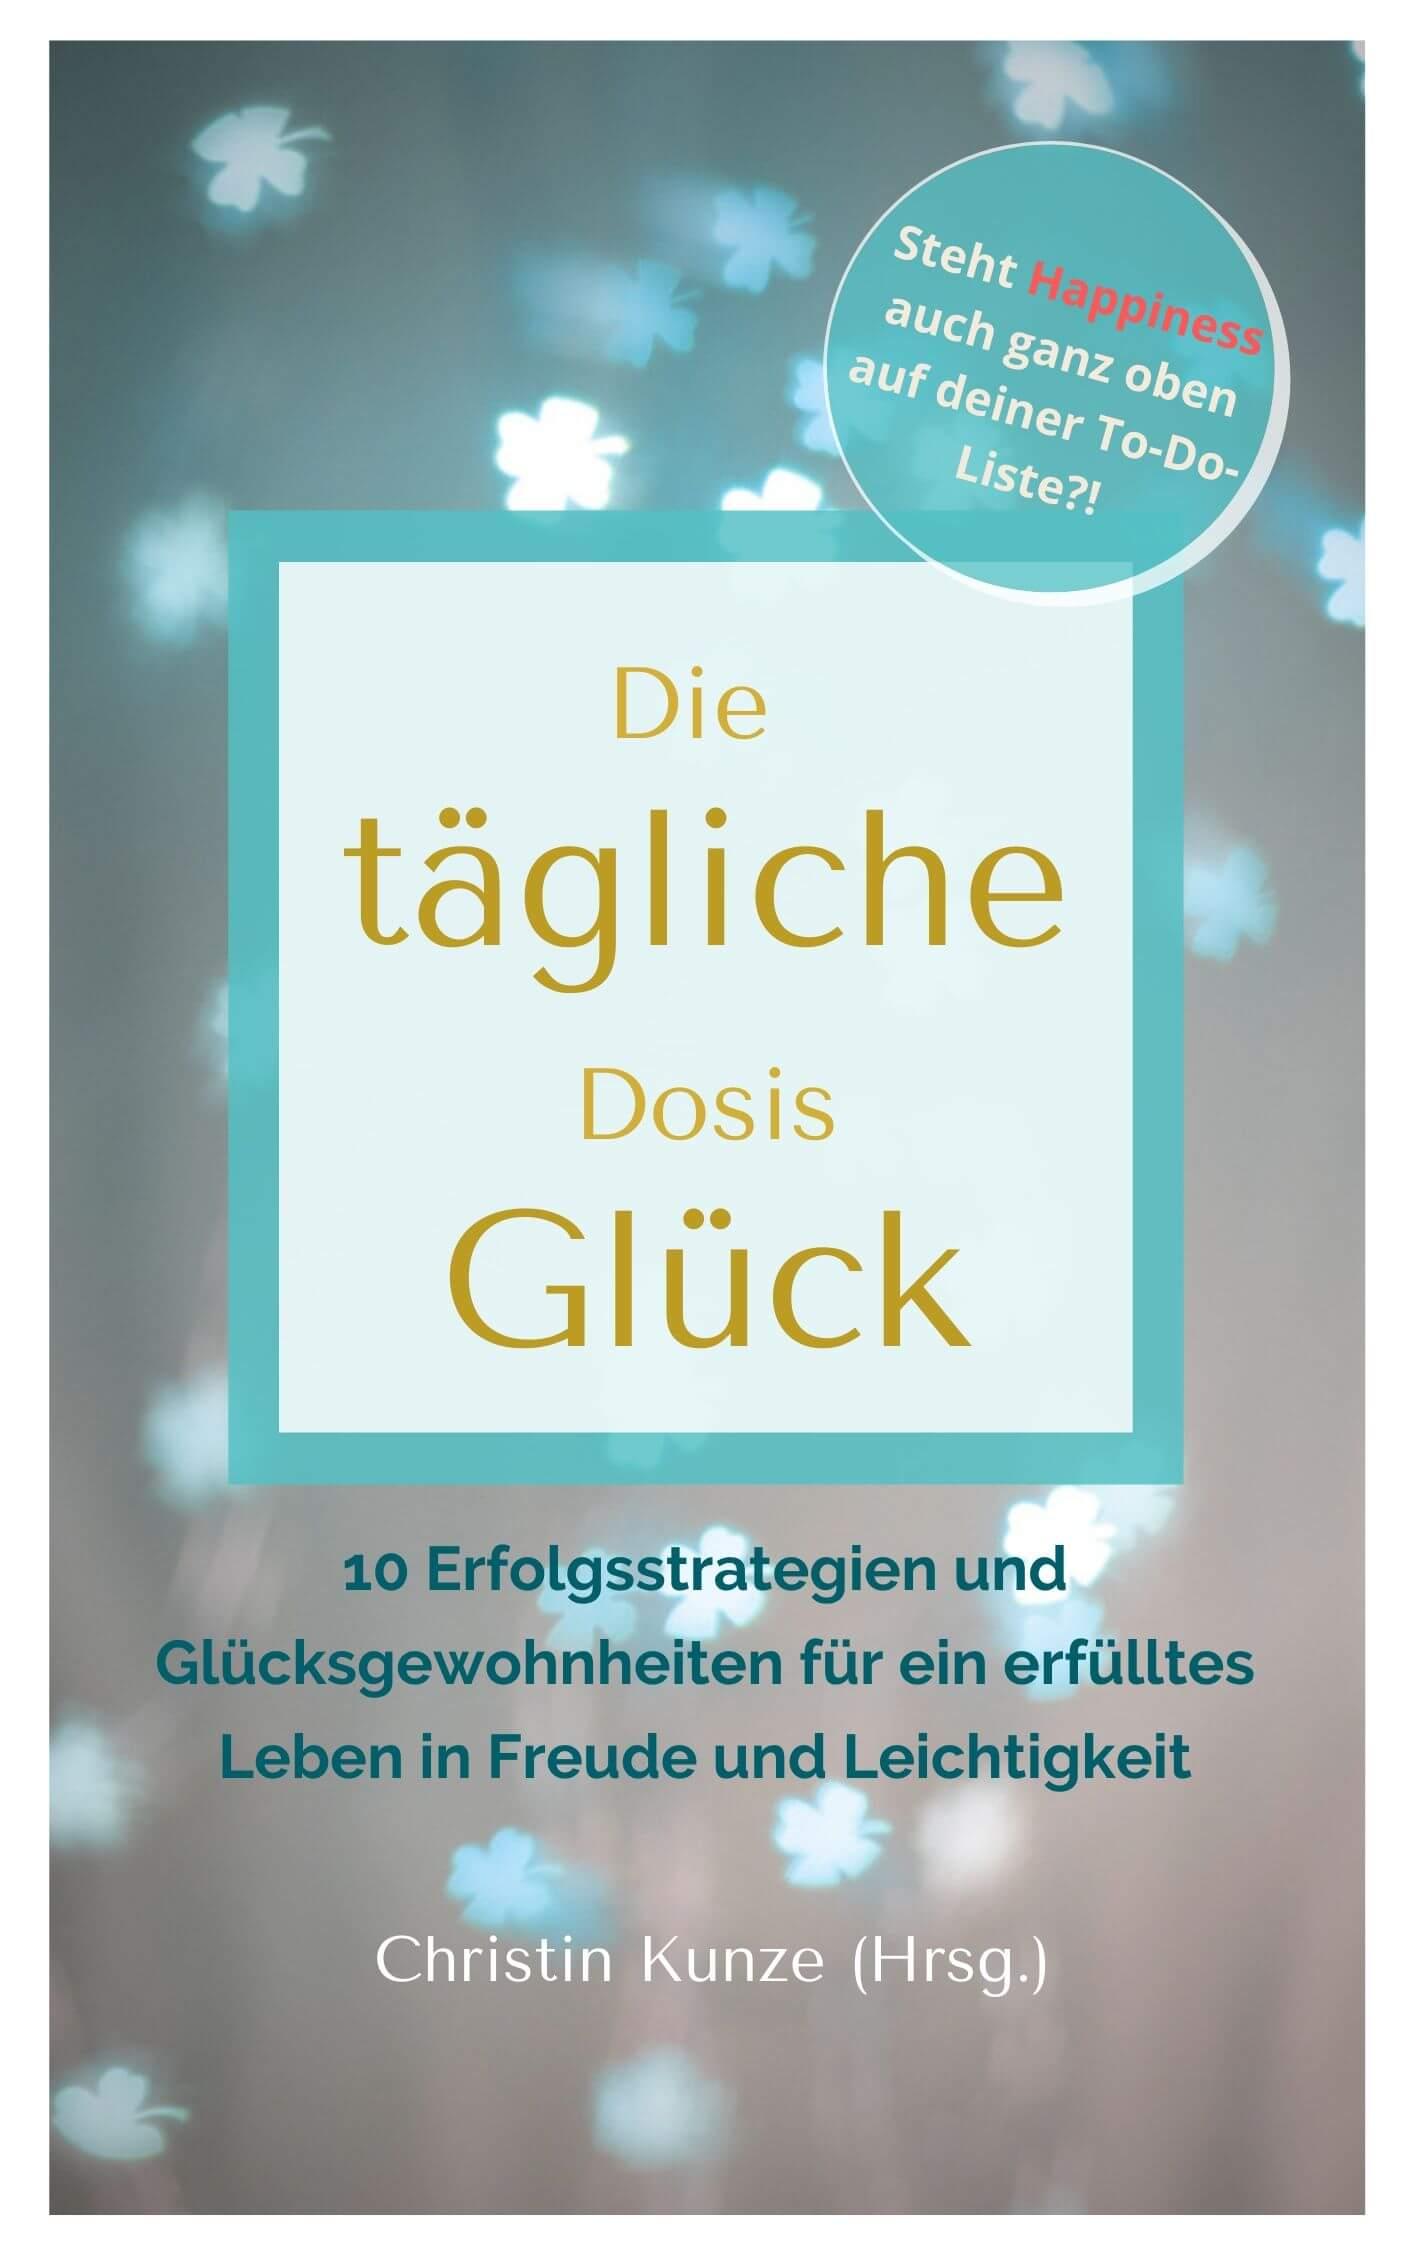 Die taegliche Dosis Glueck Christin Kunze Cover tiny - Bücher